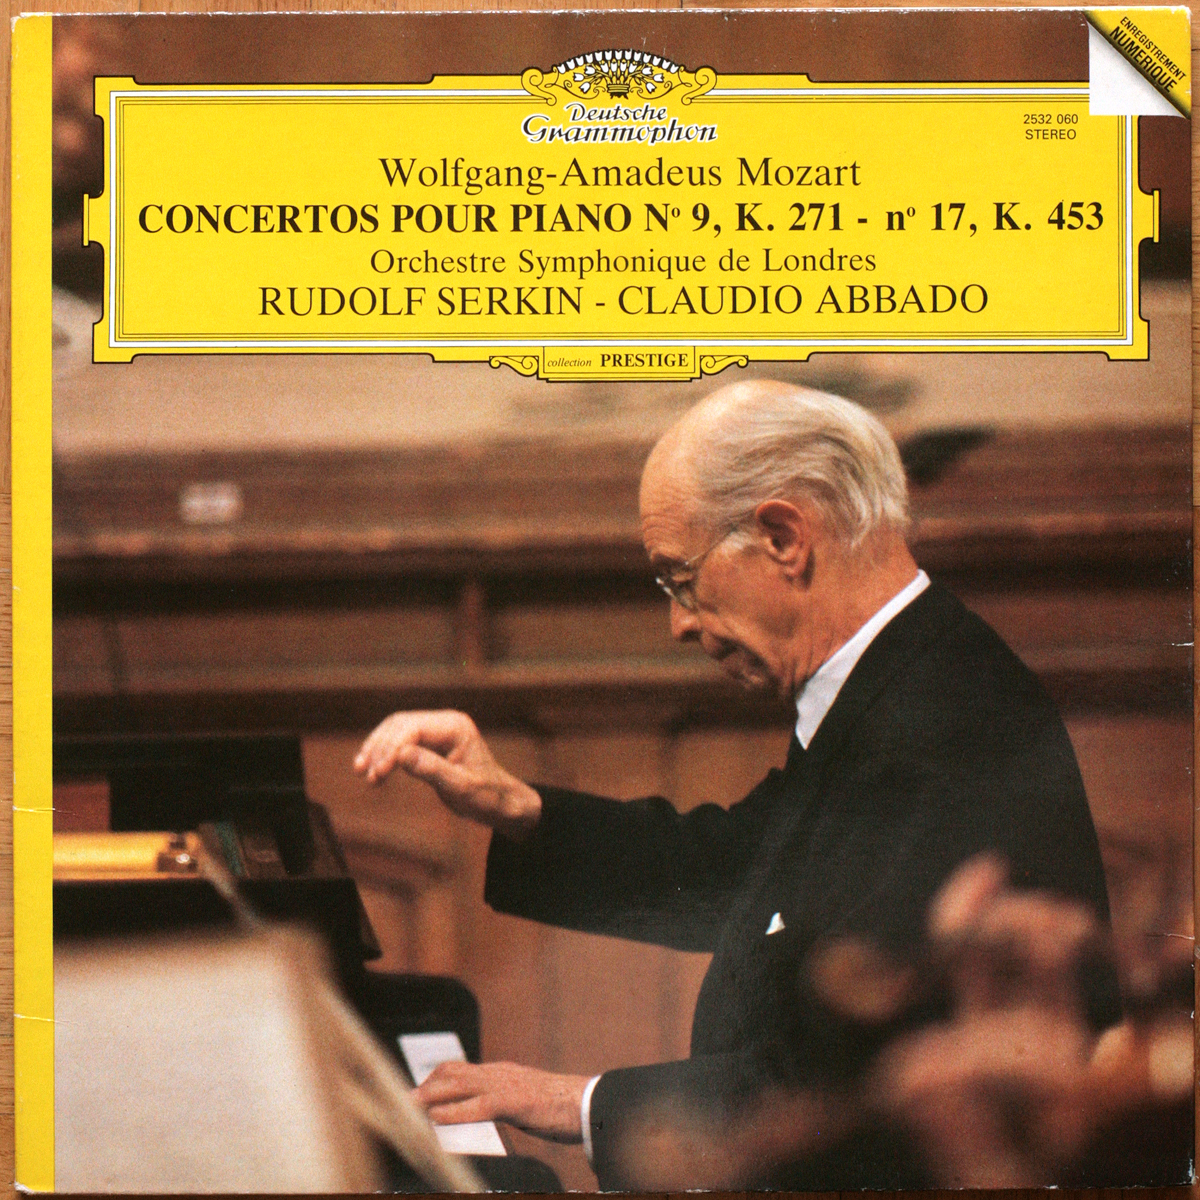 DGG 2532053 Mozart Concerto Piano 22 17 Serkin Abbado